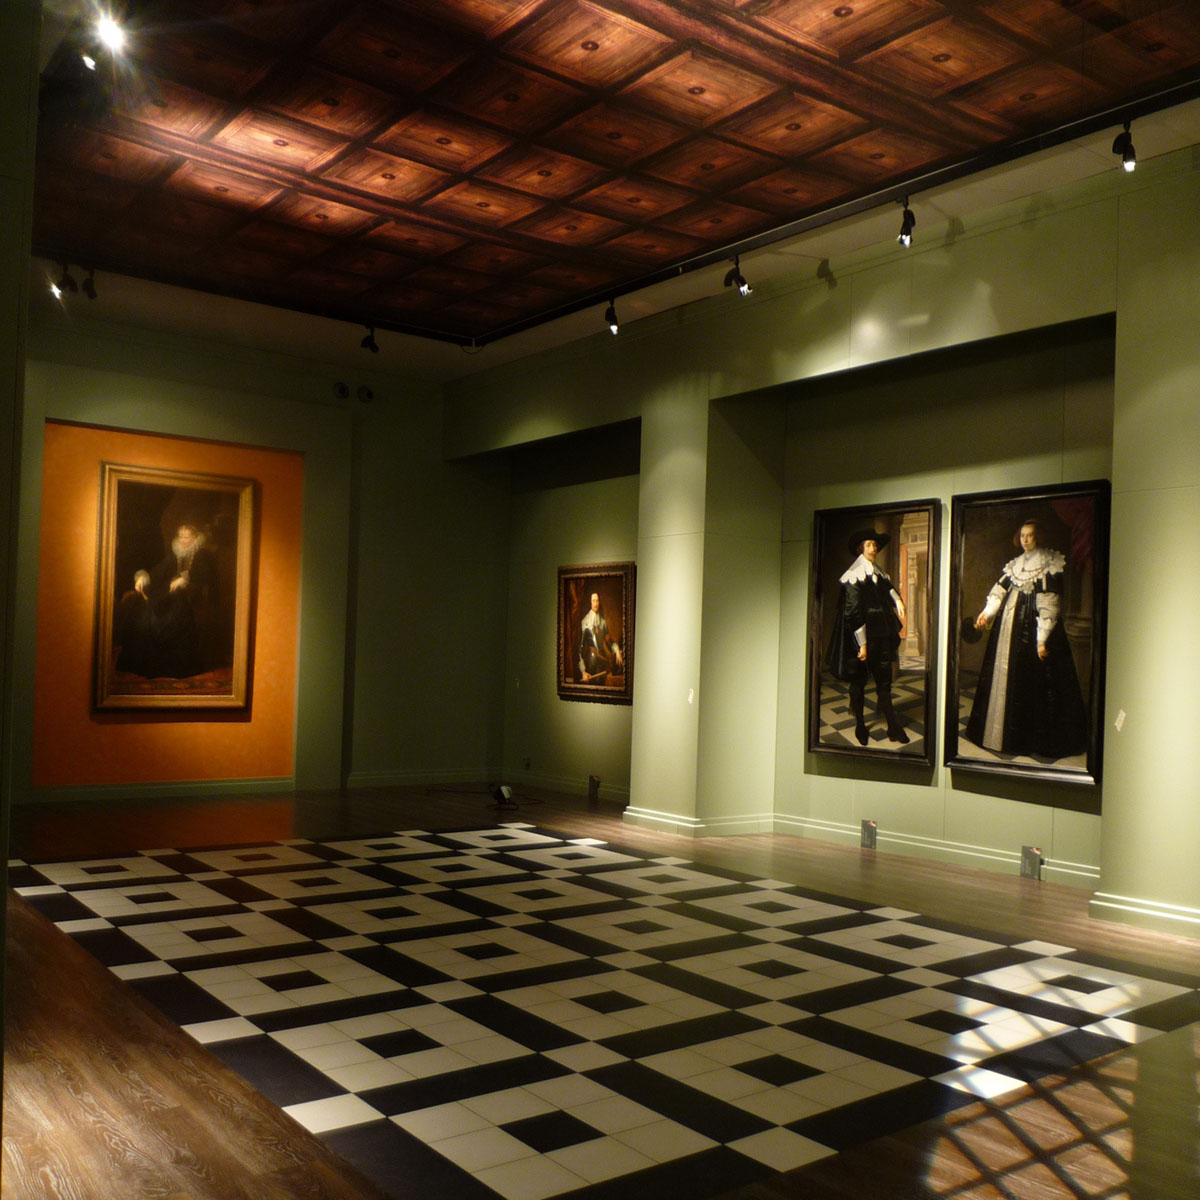 Da-Rembrandt-a-Vermeer-005